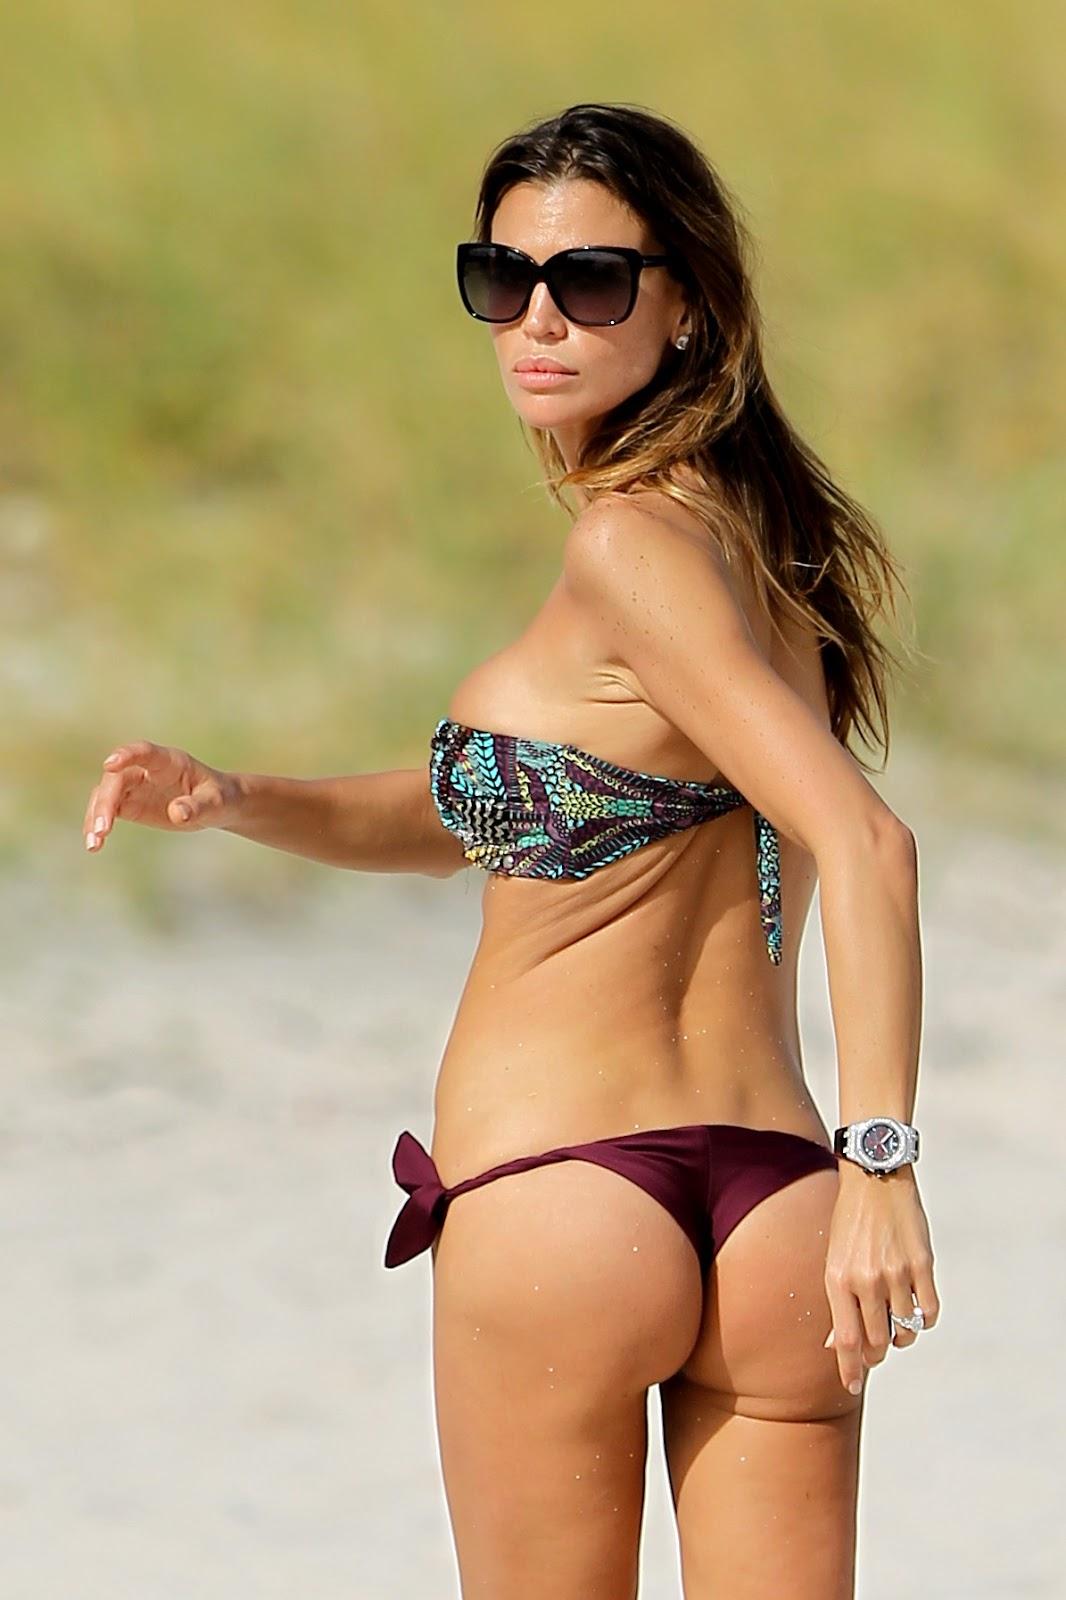 Dhoom 2 bikini